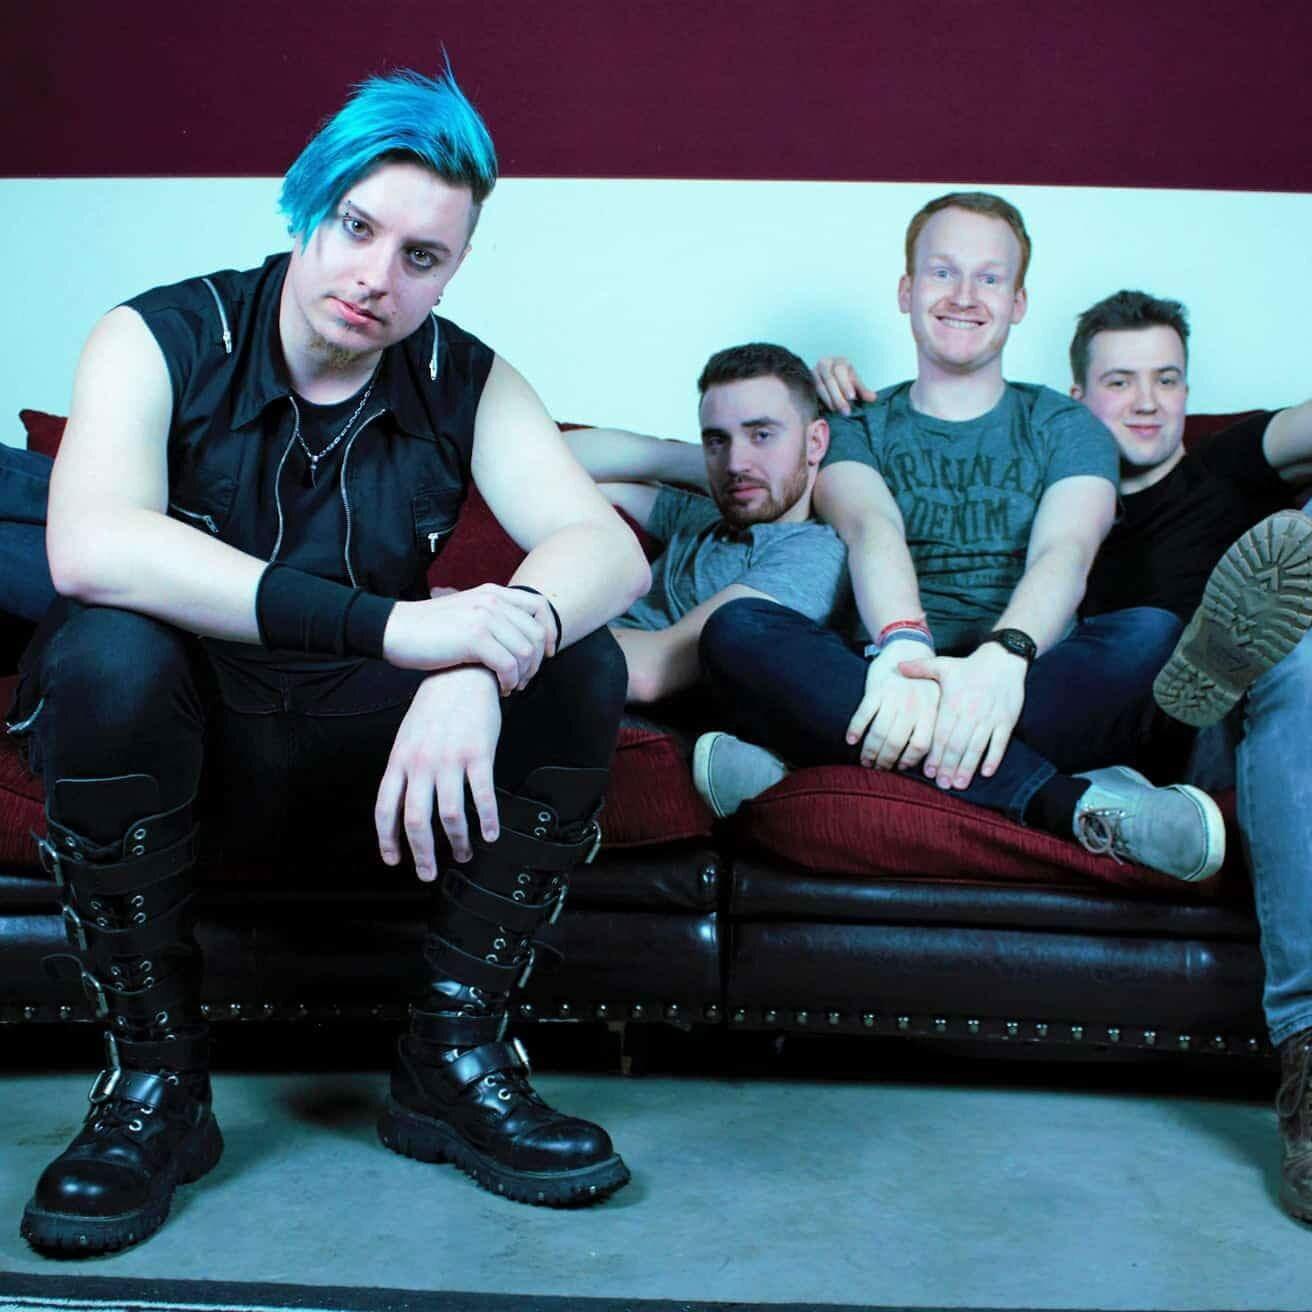 Stereobugs - Album Release